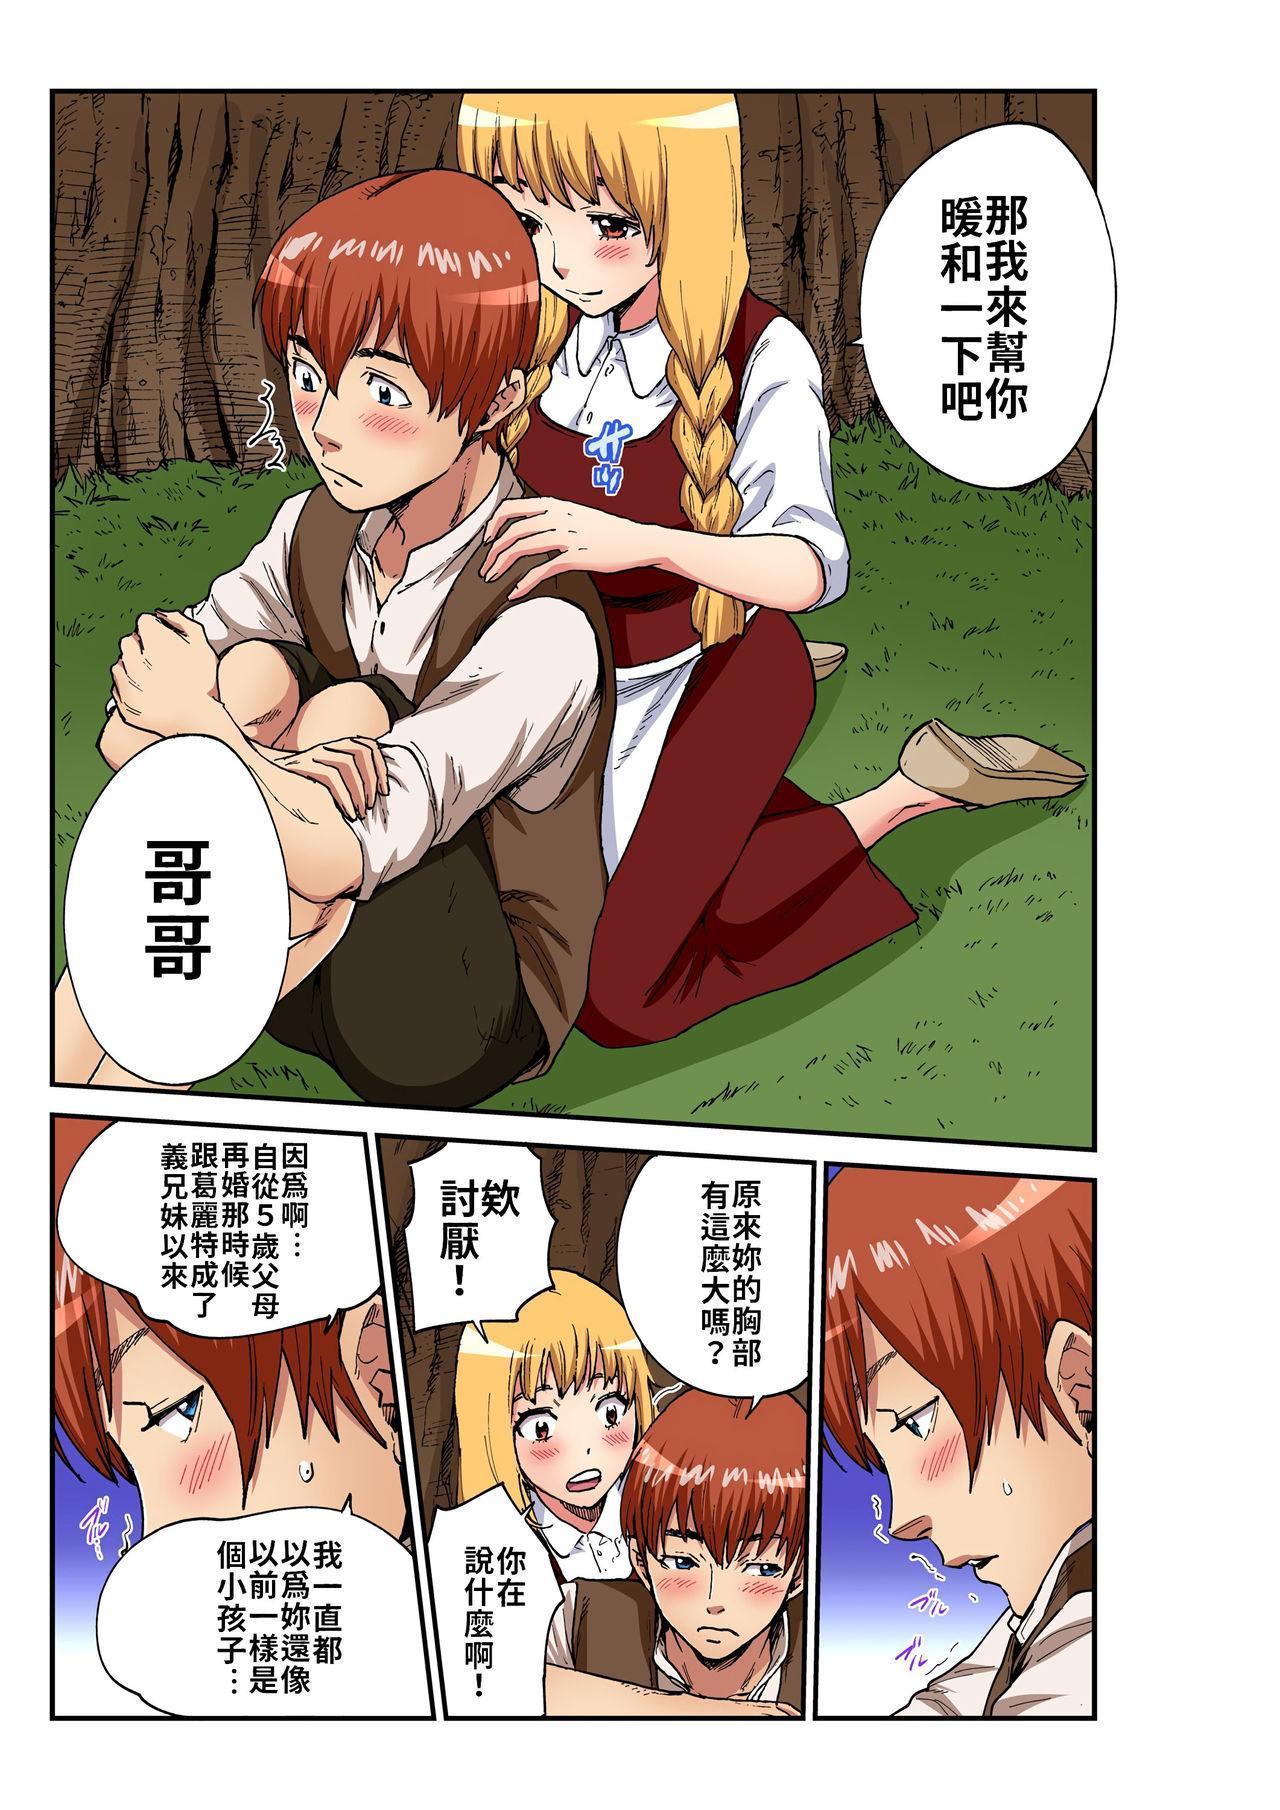 Otona no Douwa ~Henzeru to Gure-teru   大人的童話~糖果屋 5